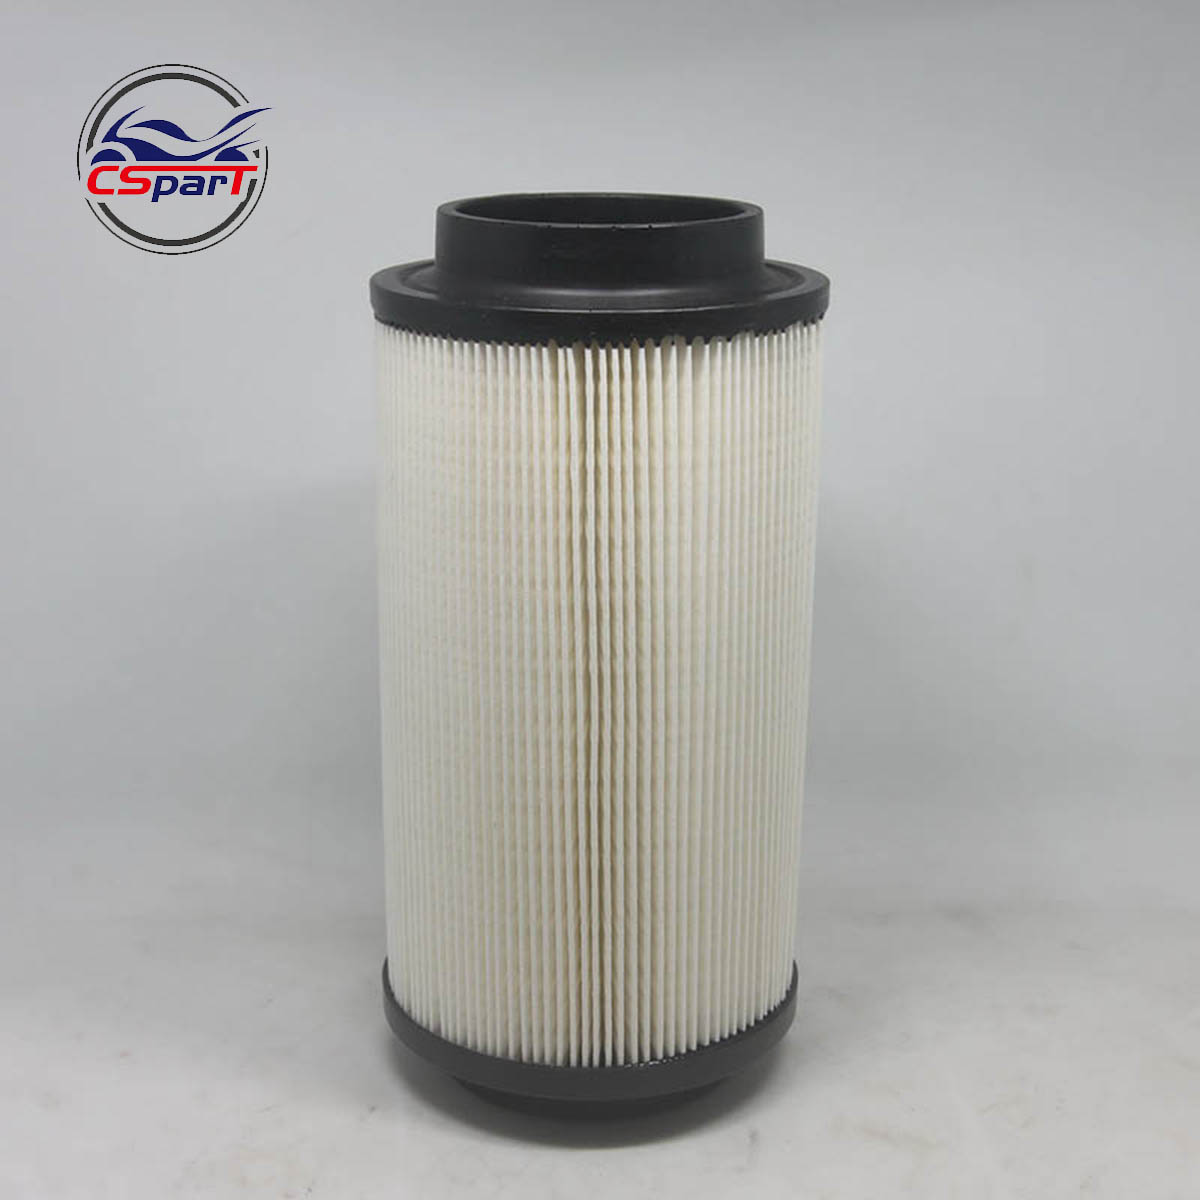 OEM Air Filter For LINHAI 260 300 FA D H LH260  BUYANG FEISHEN ATV Parts